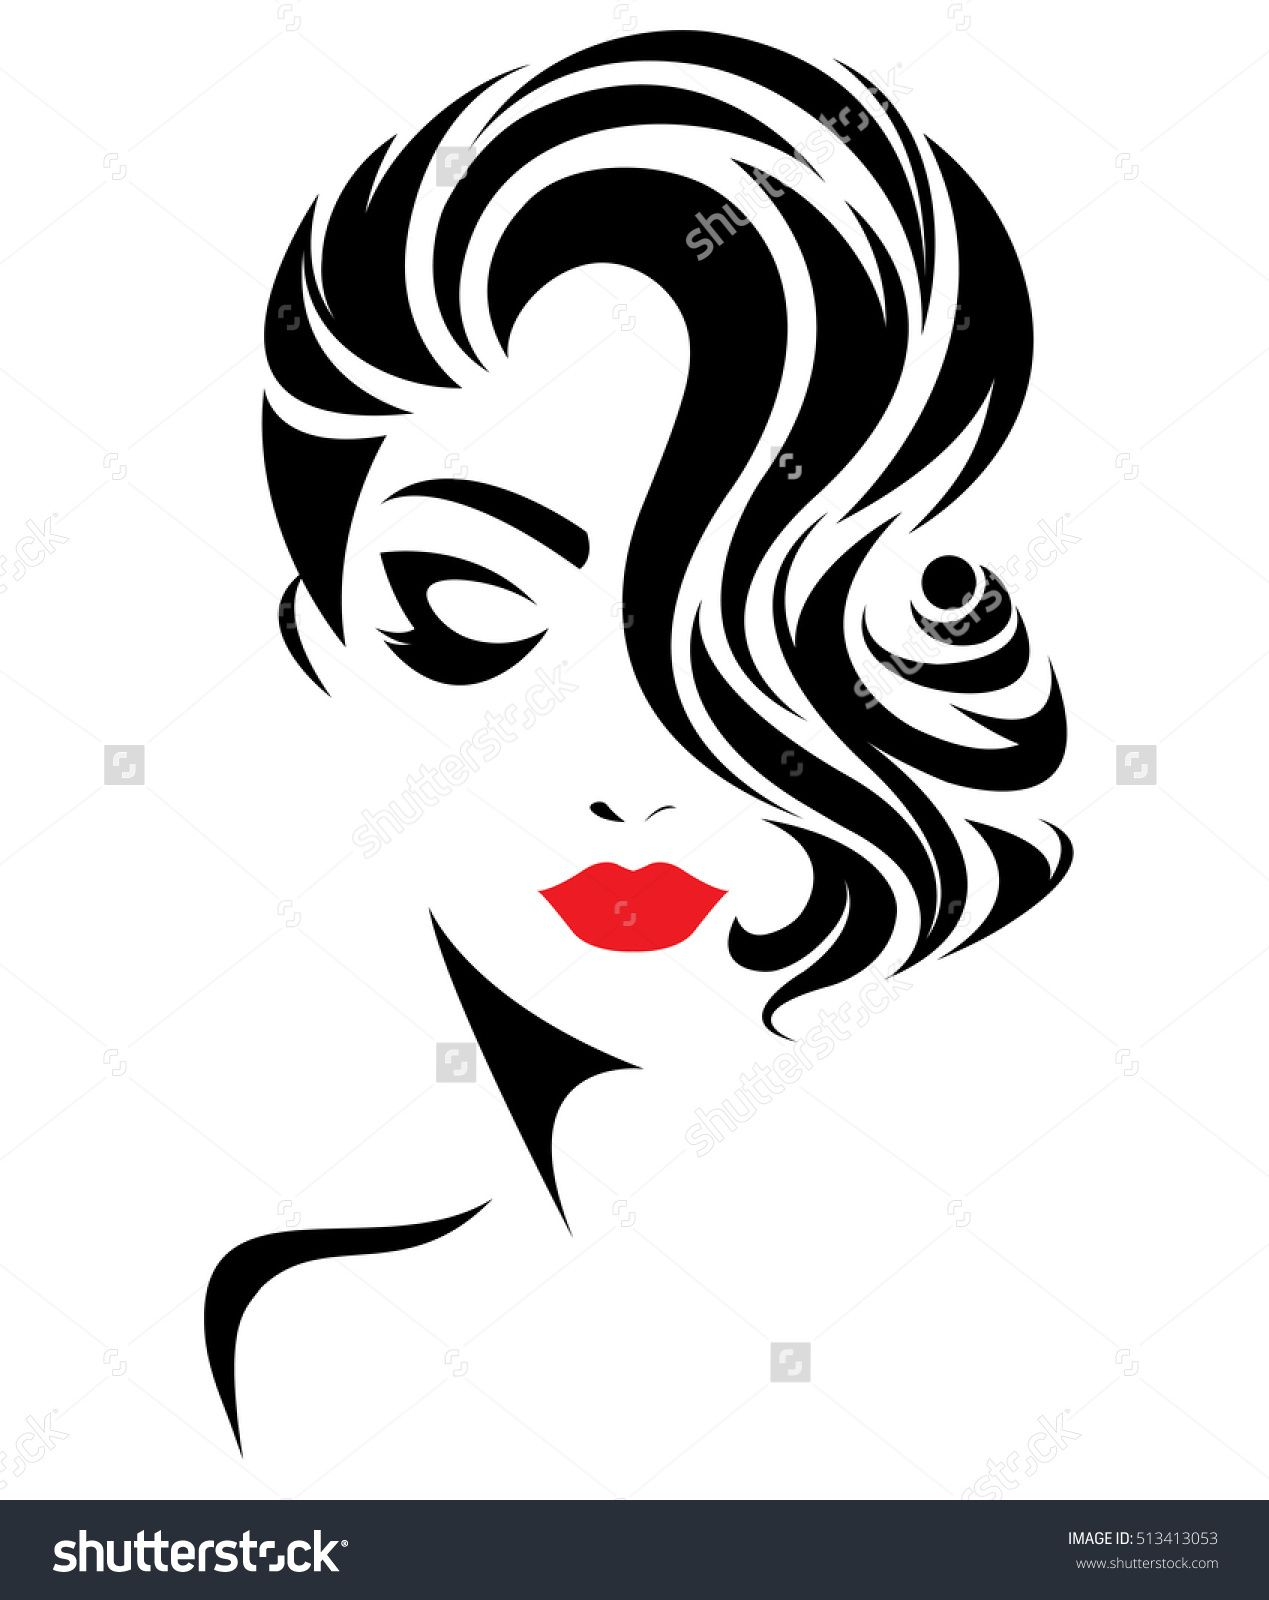 illustration of women short hair style icon, logo women